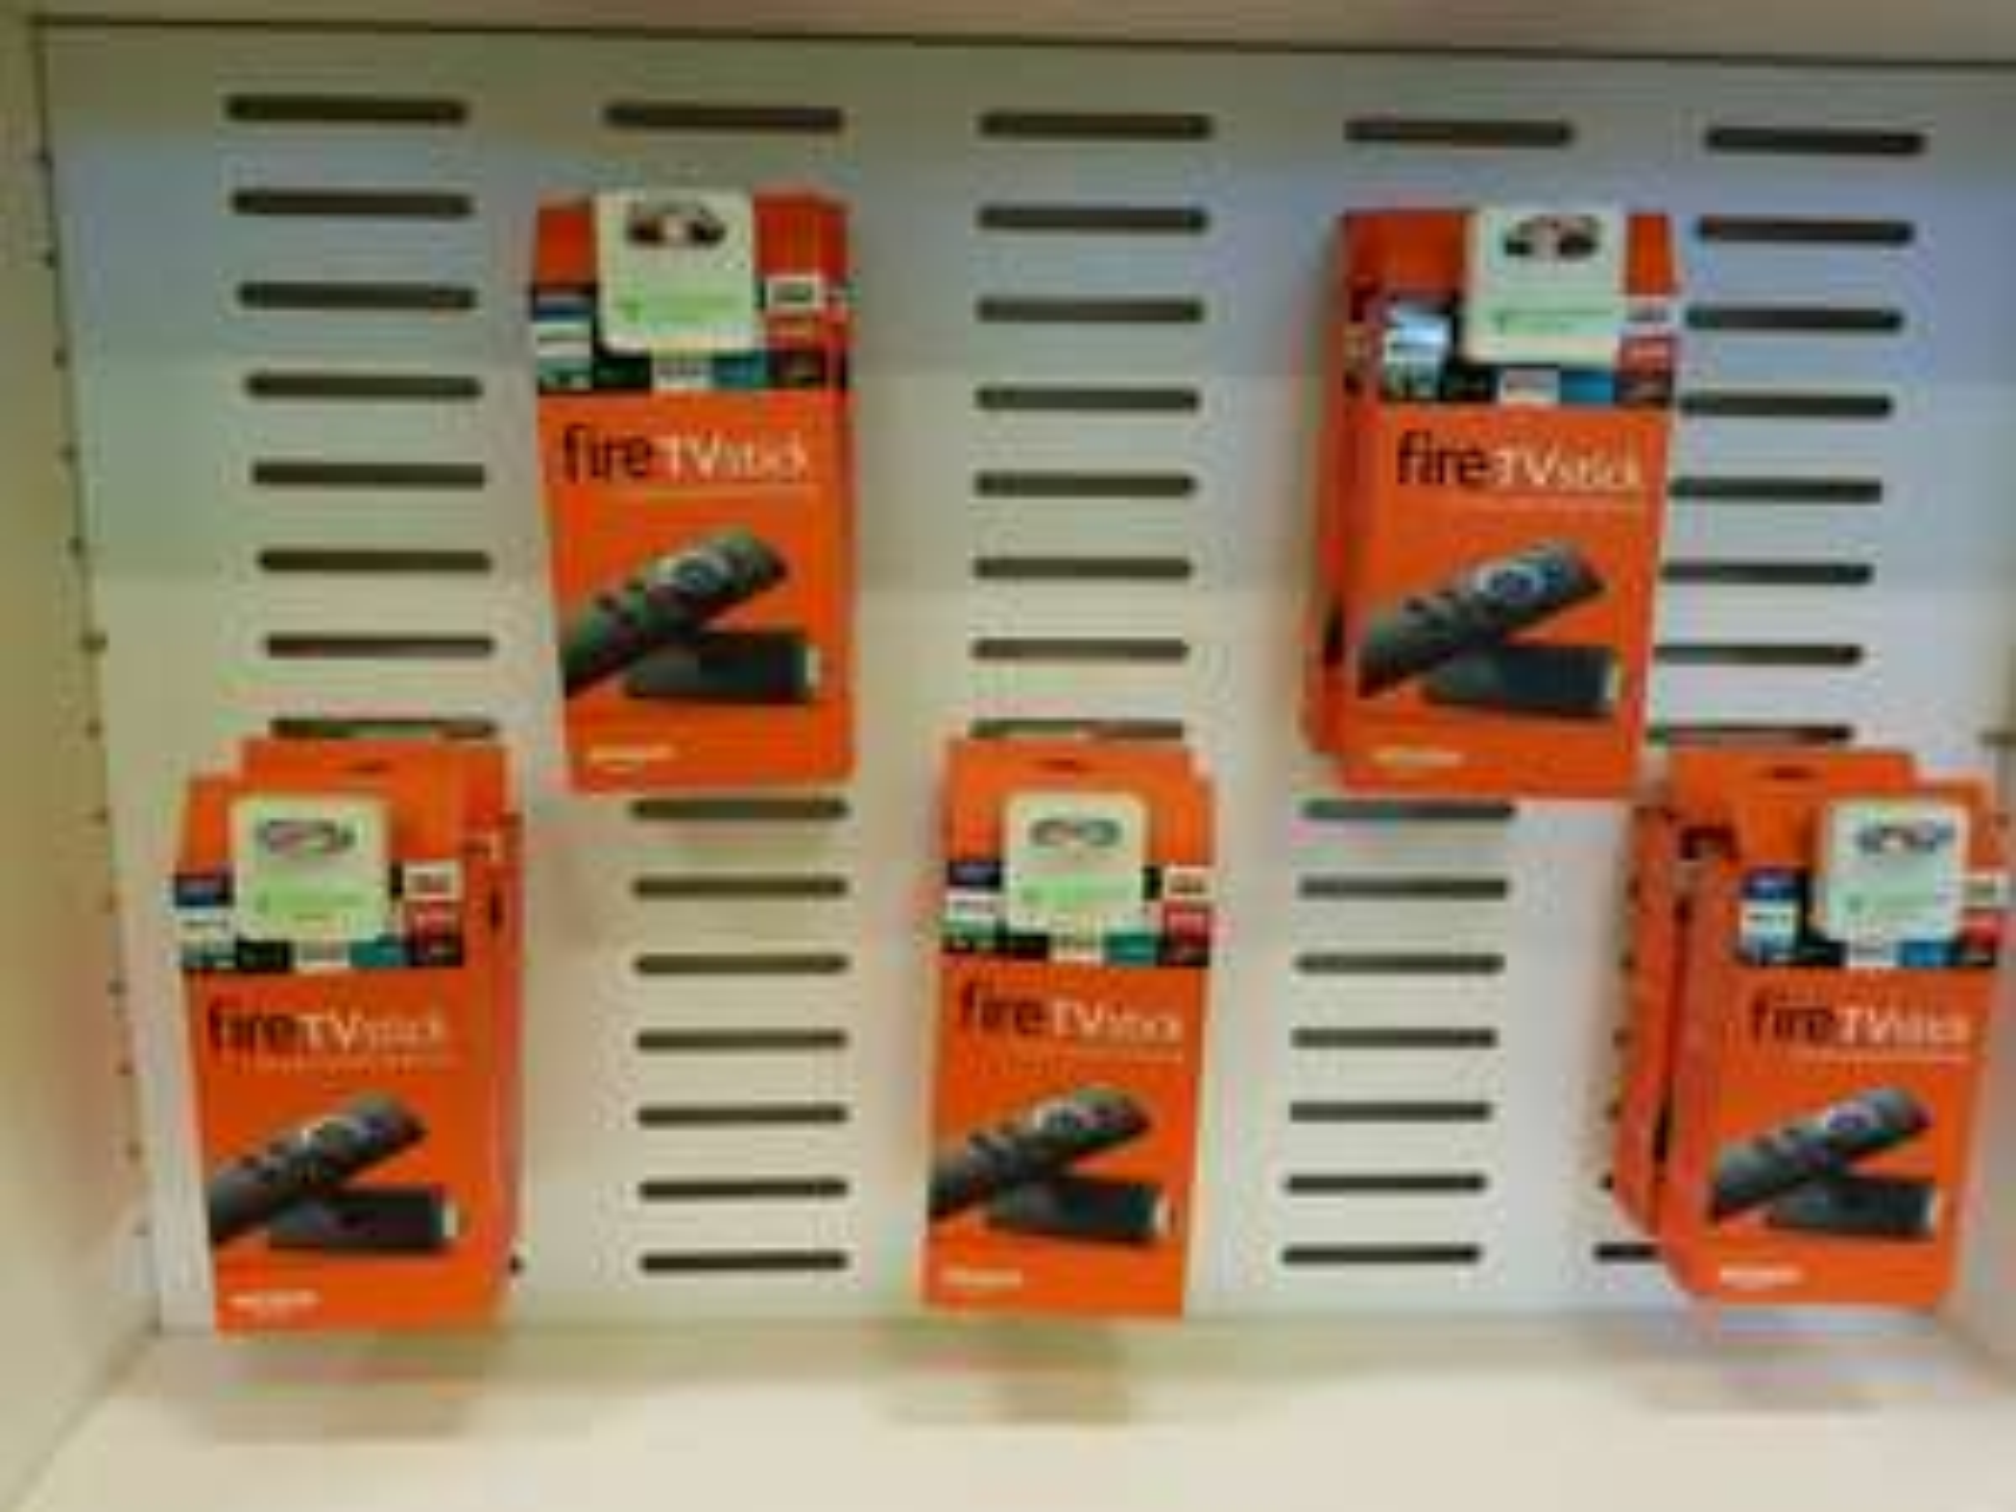 Amazon firetv stick - mobilcom debitel im Shop in der Badstr.64, 13357 Berlin